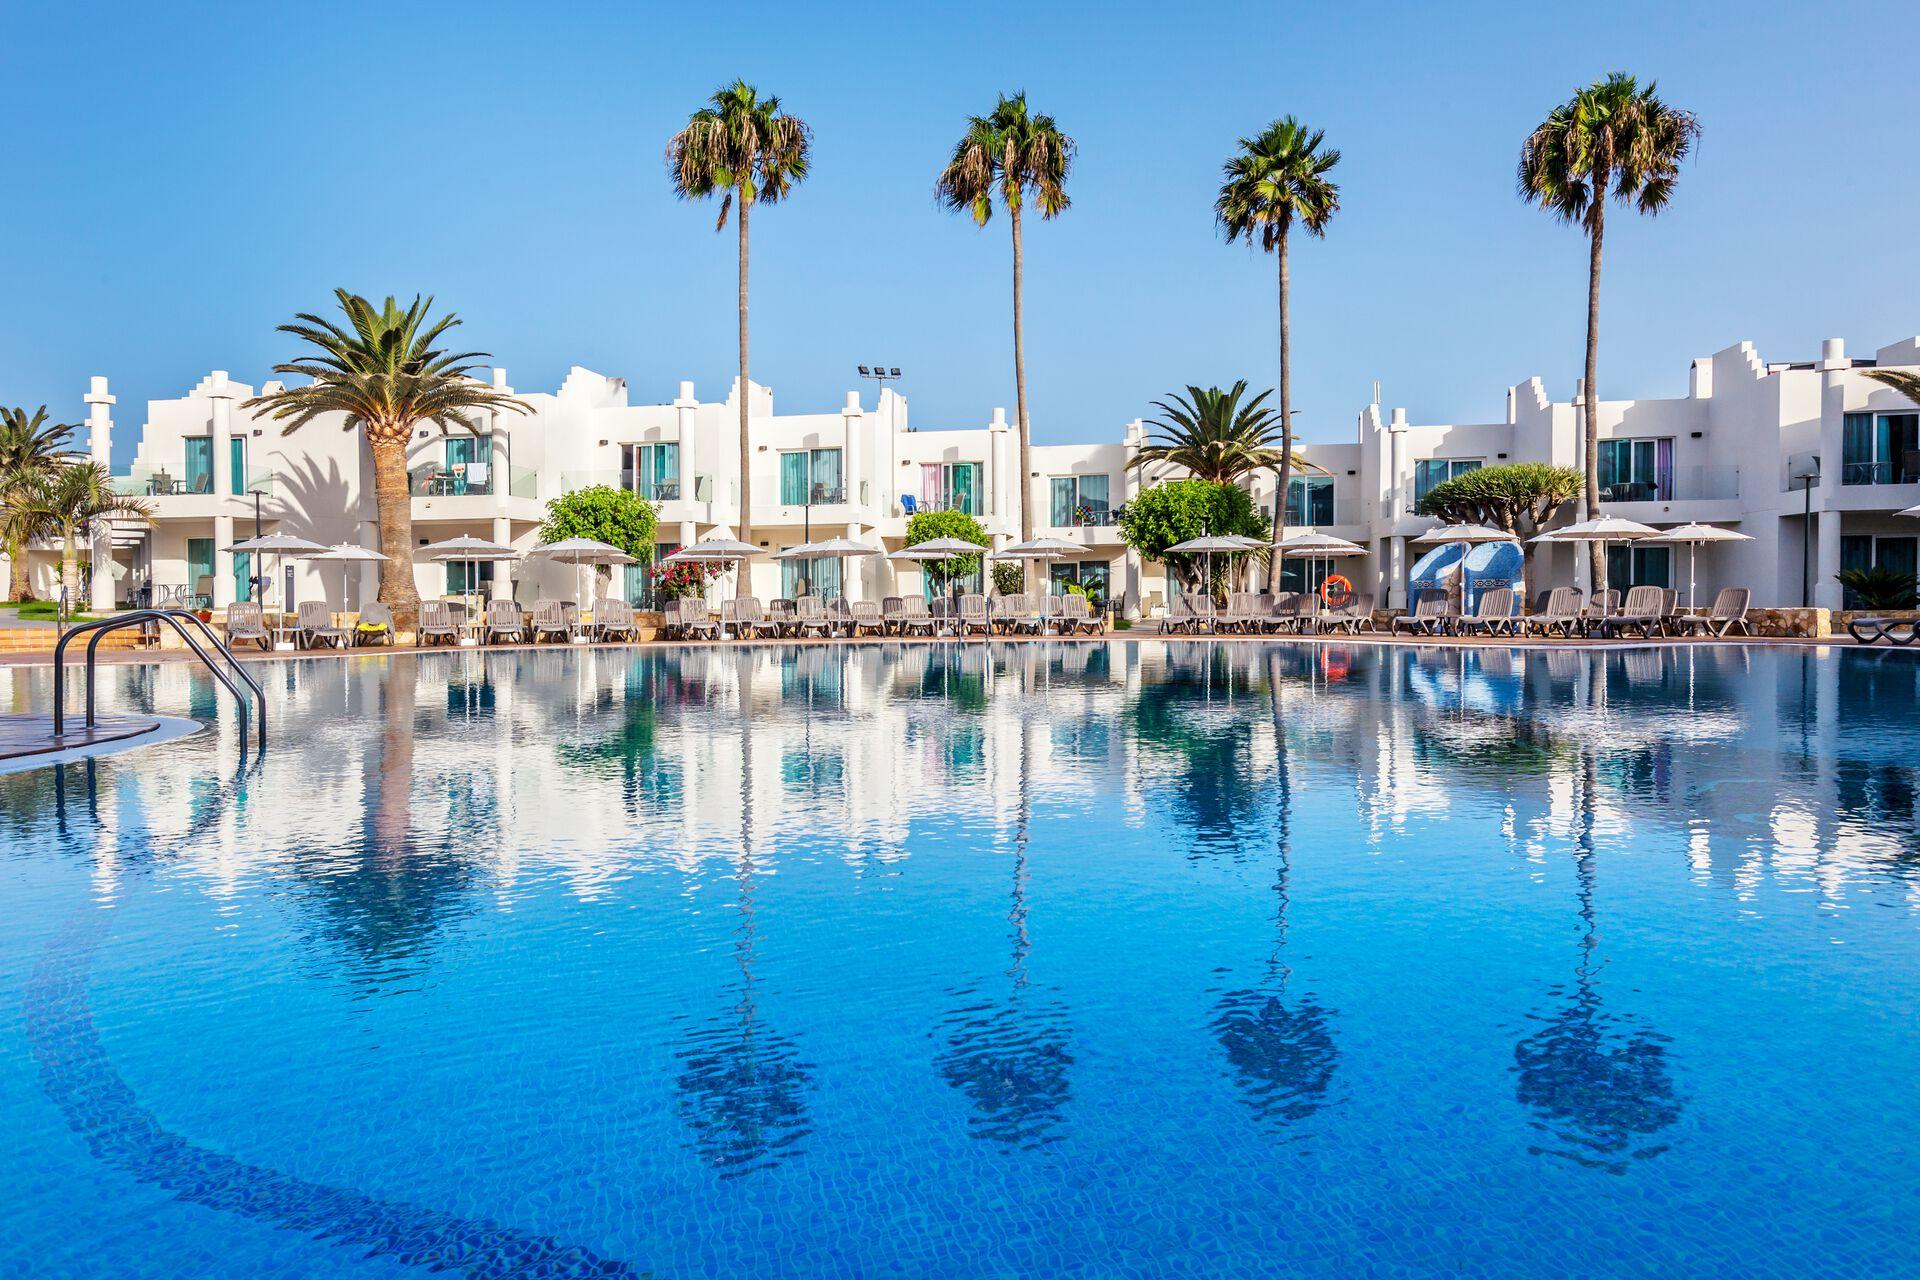 Hotel Barceló Corralejo Sands 4 Fuerteventura Canaries Canaries Espagne Avec Voyages Leclerc Fti Ref 666291 Mars 2021 Avril 2021 Mai 2021